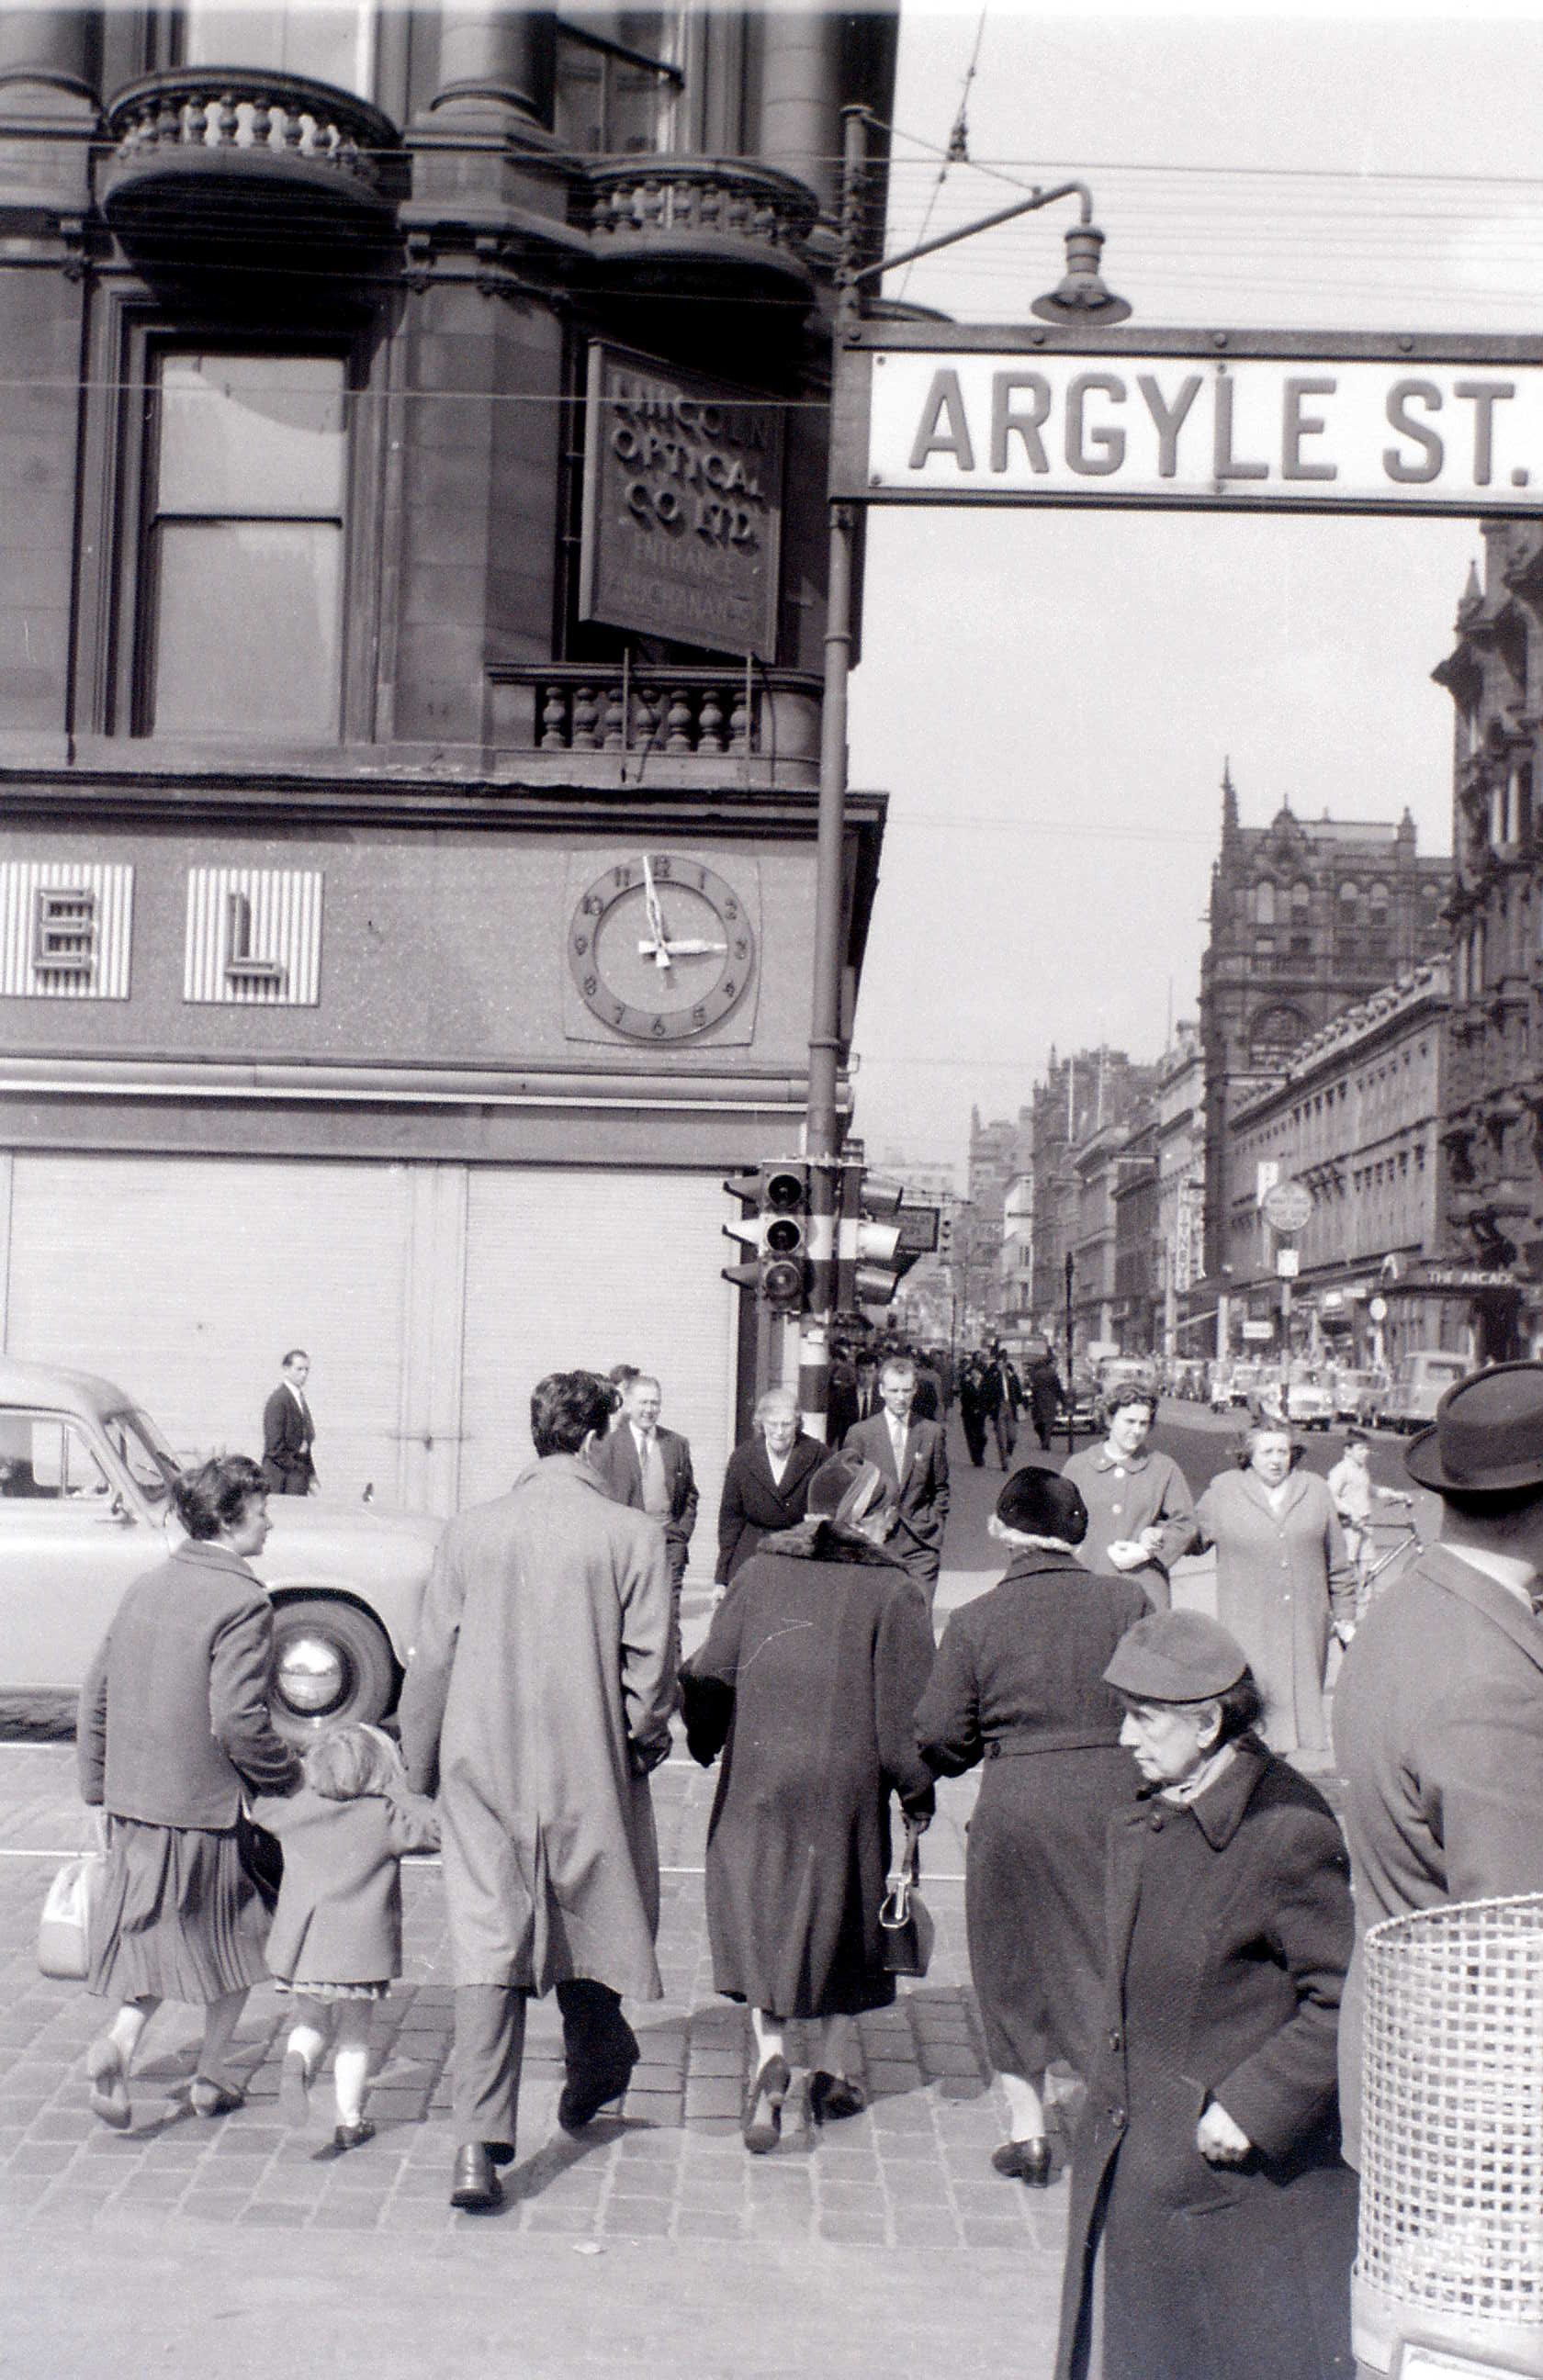 Глазго, 19 апреля 1960. Аргайл-Стрит и Бьюкенен-стрит.jpg